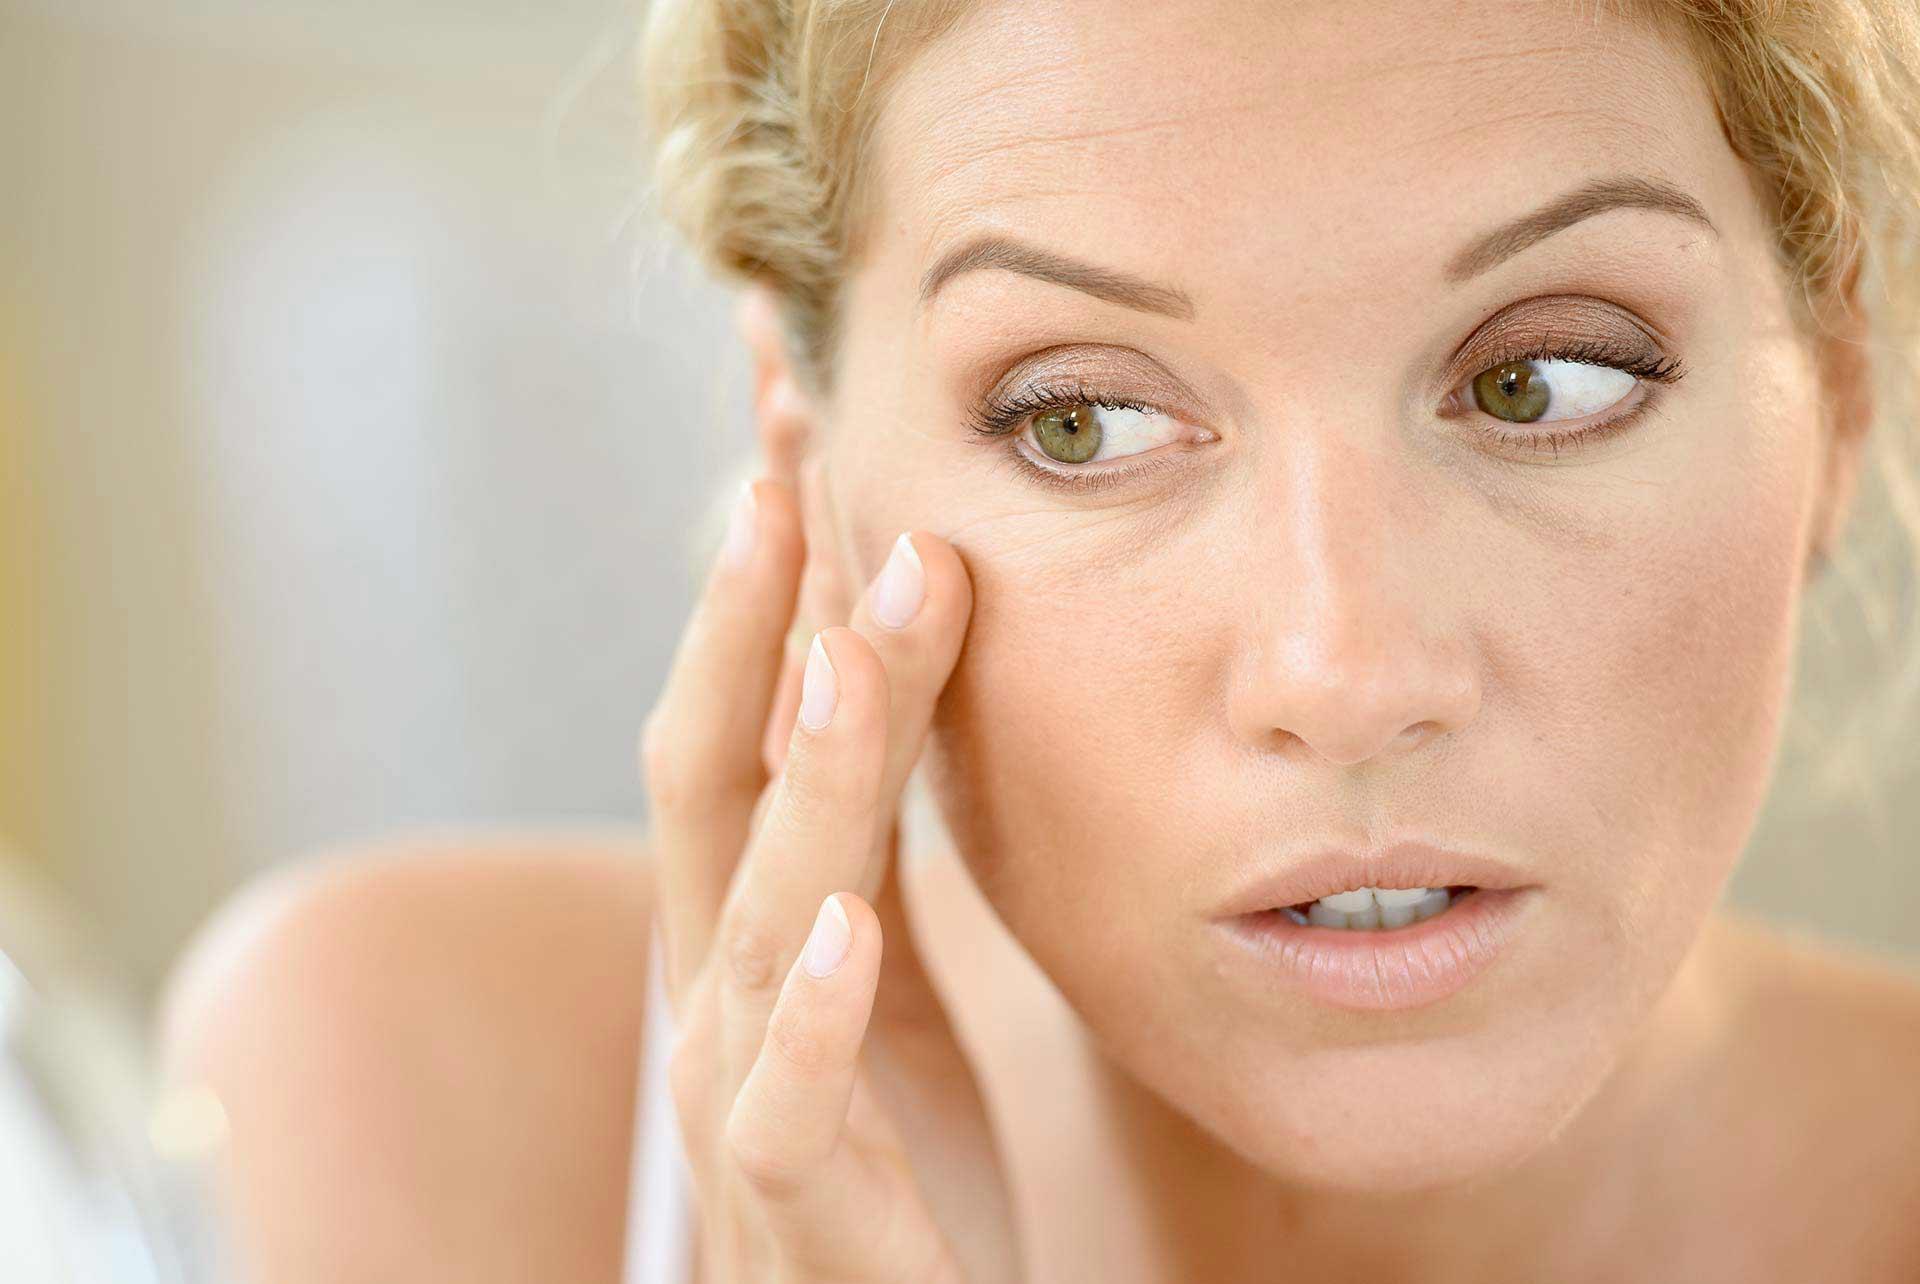 Tear Trough Filler London | The Cosmetic Skin Clinic